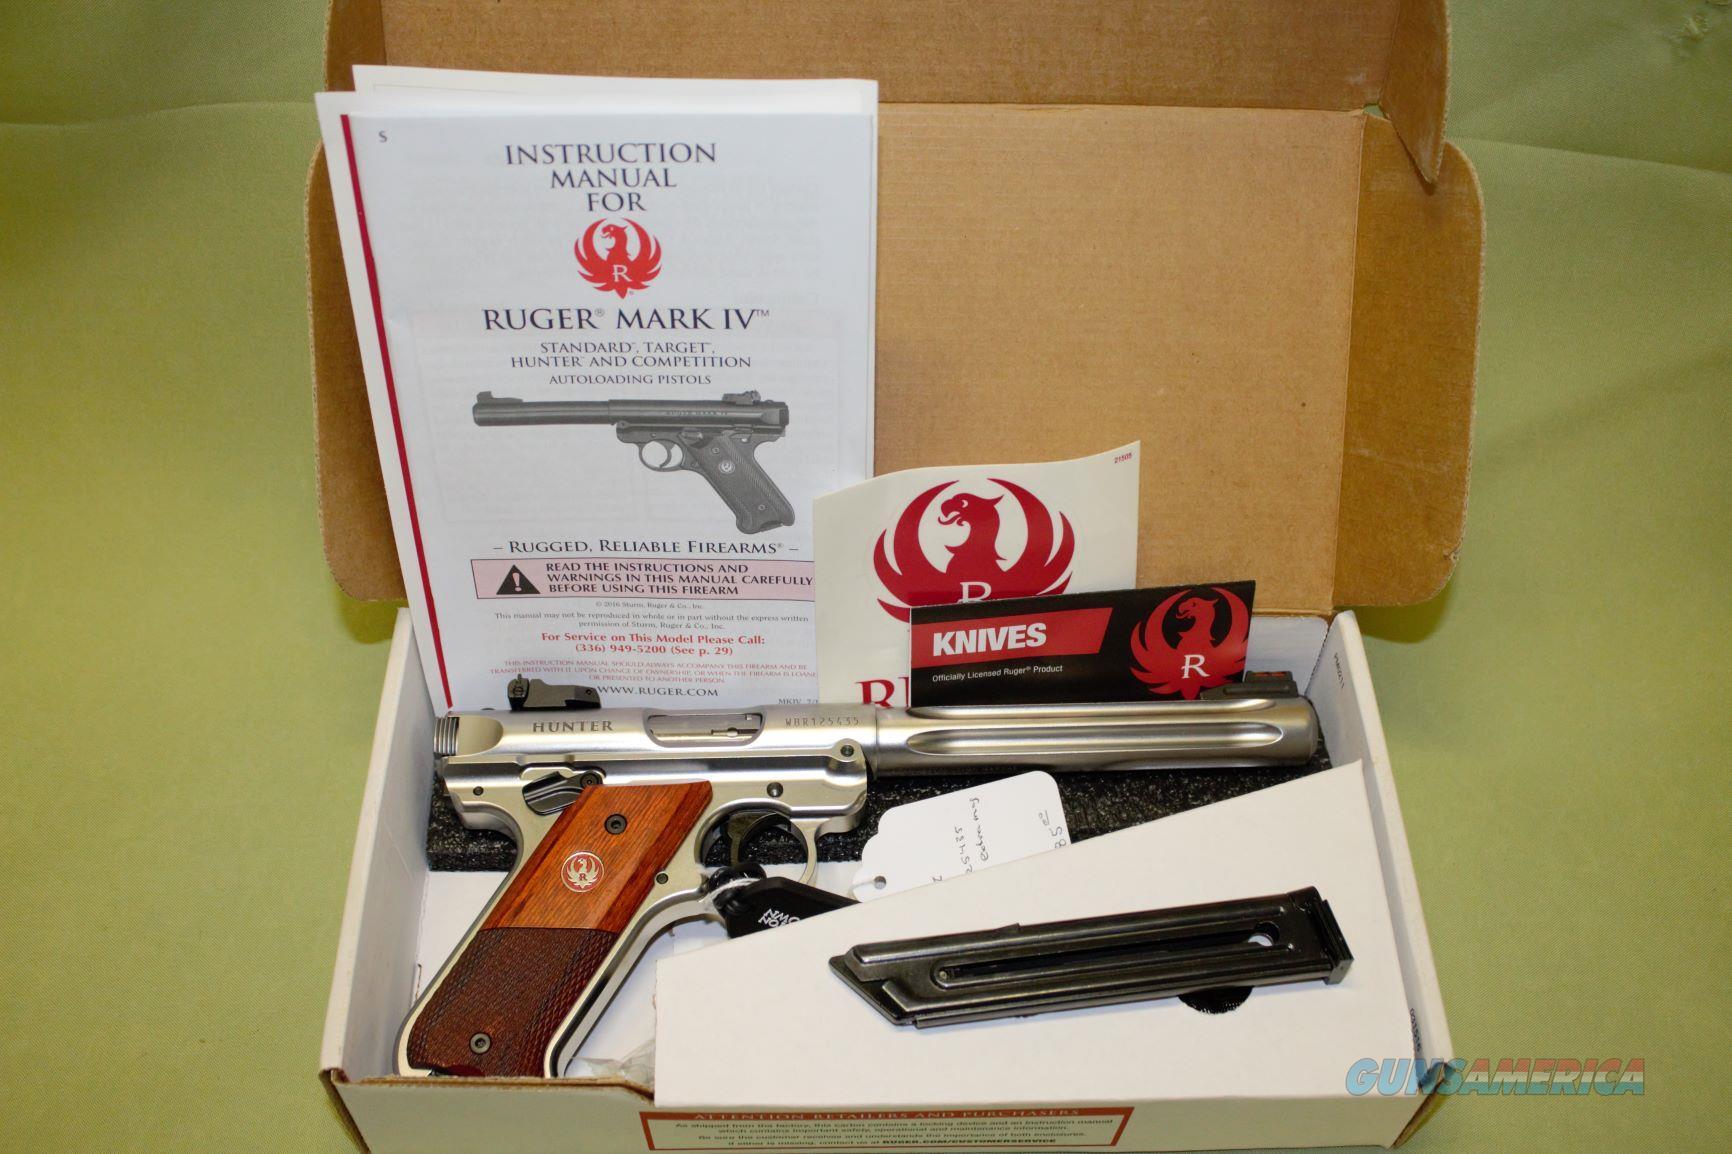 Ruger Mark IV Hunter 22 LR  Guns > Pistols > Ruger Semi-Auto Pistols > Mark I/II/III/IV Family